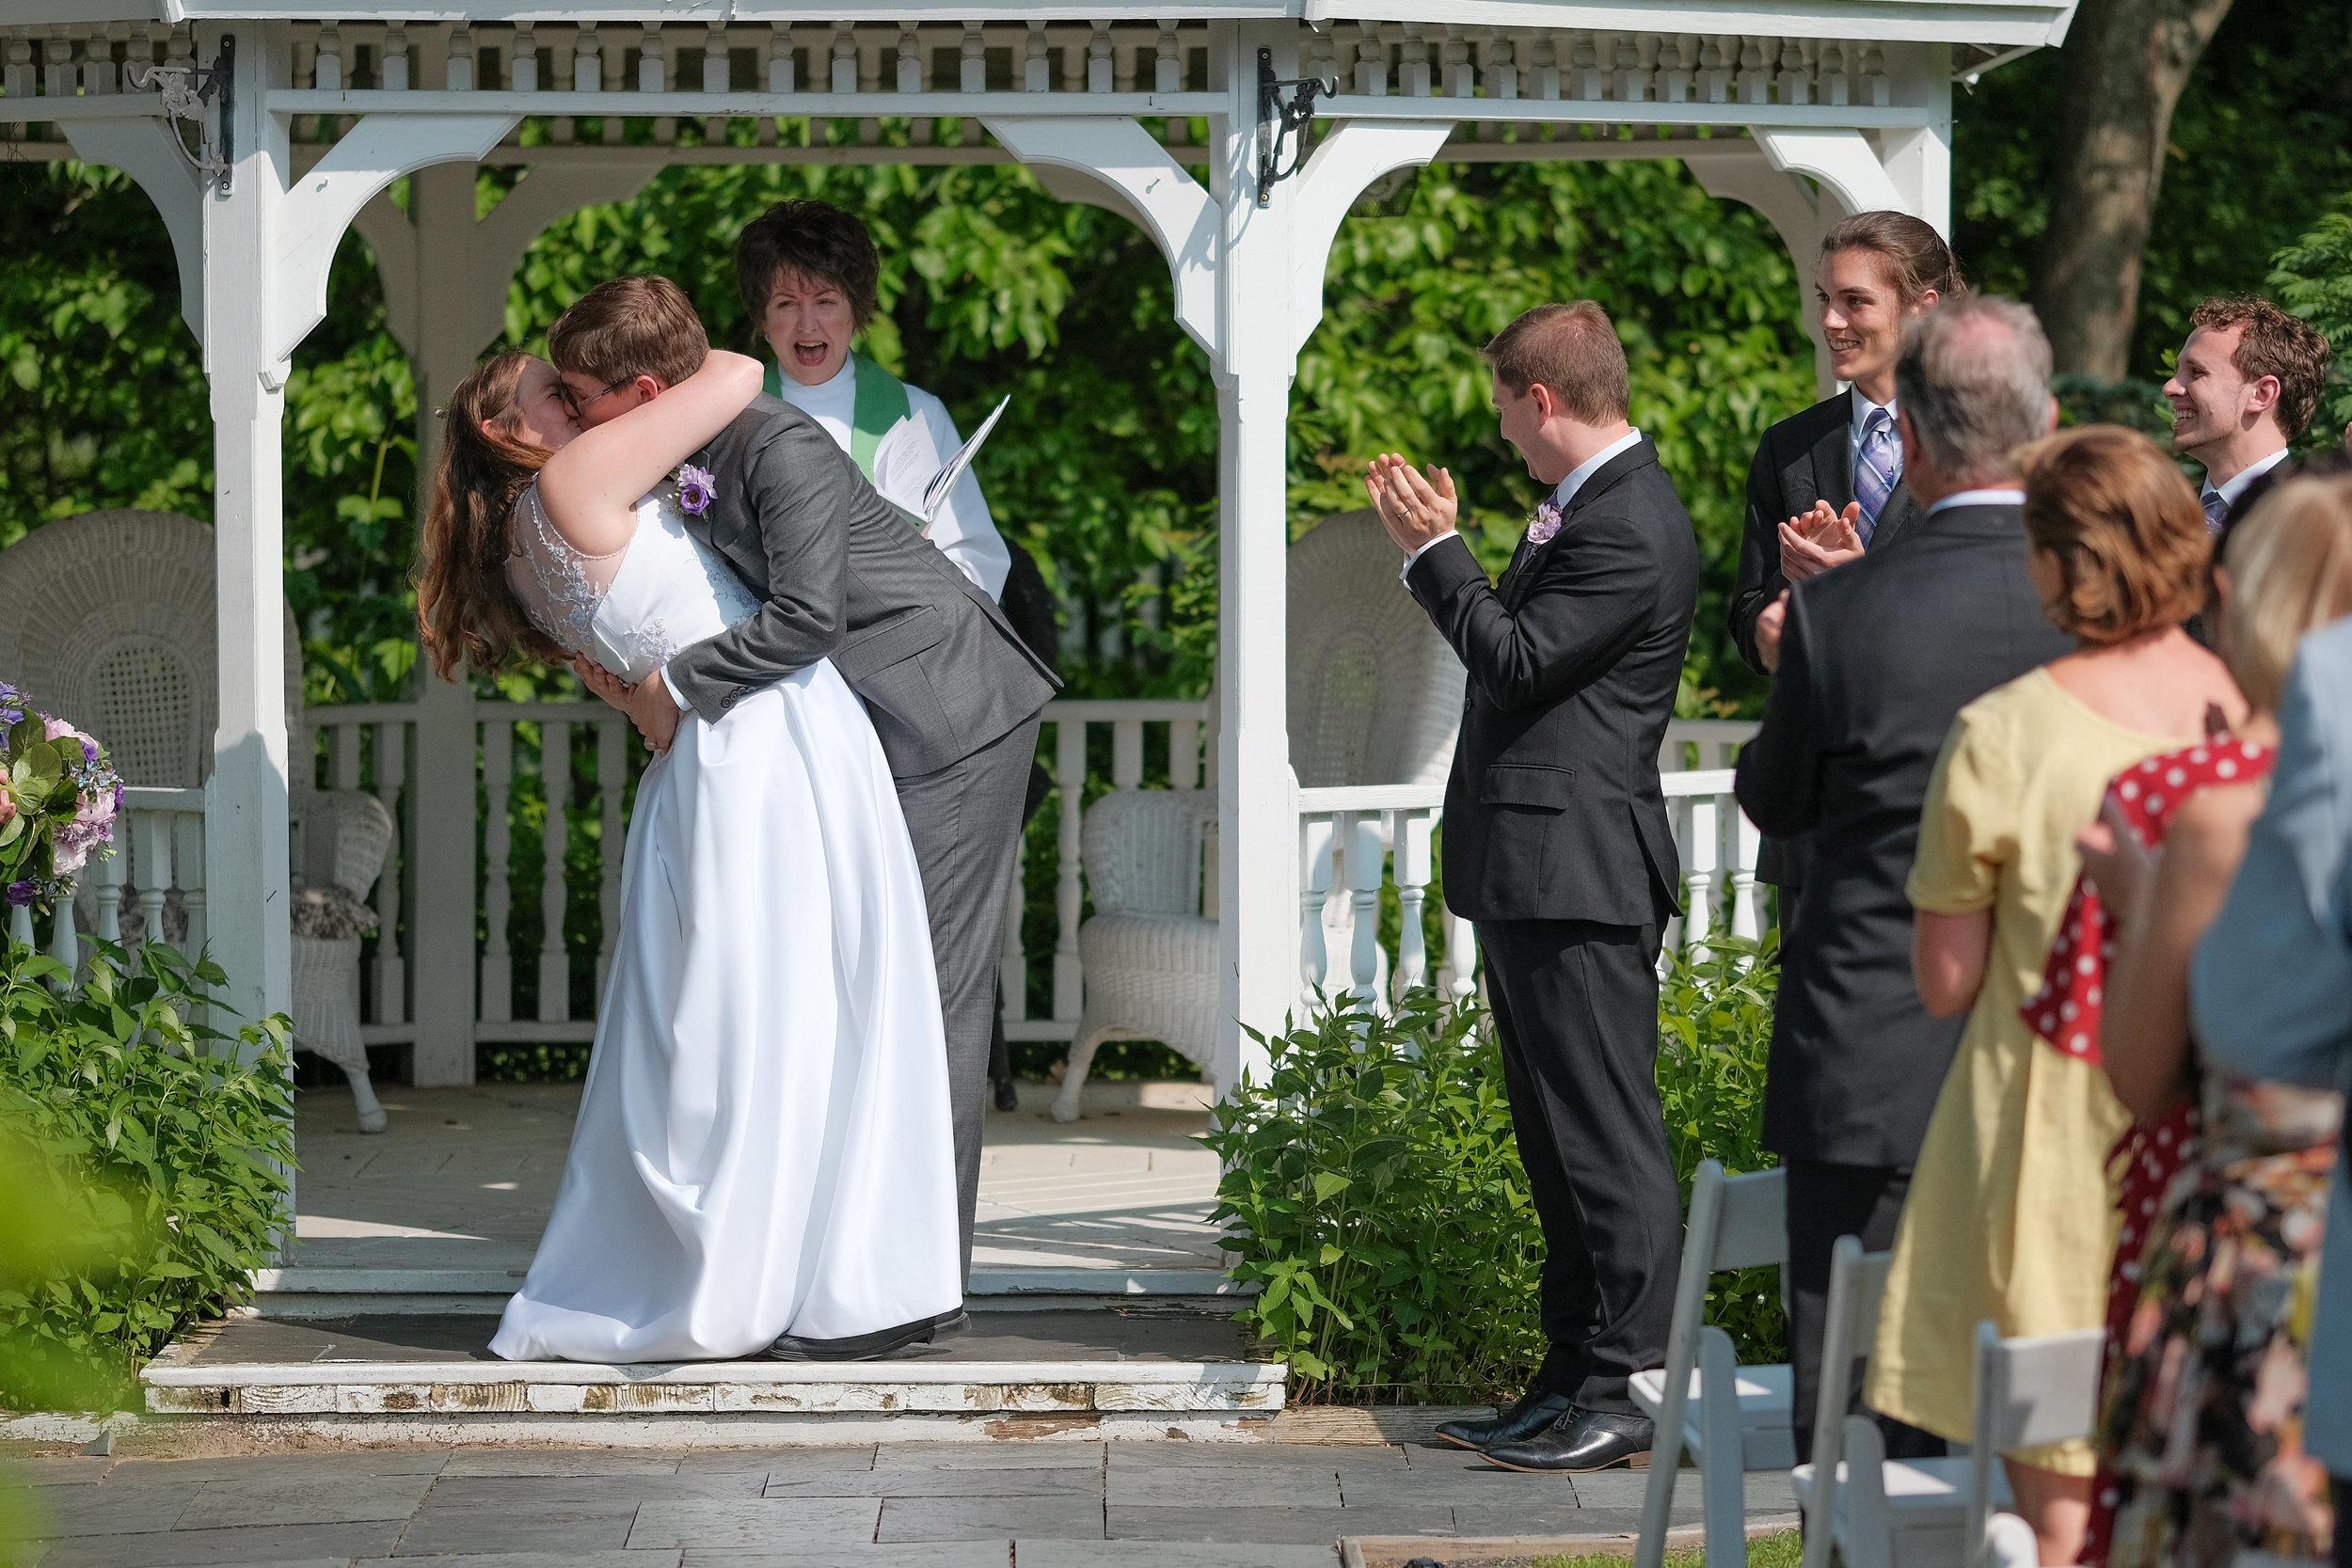 Vermont-Lilac-Inn-Wedding-Photography-682.jpg